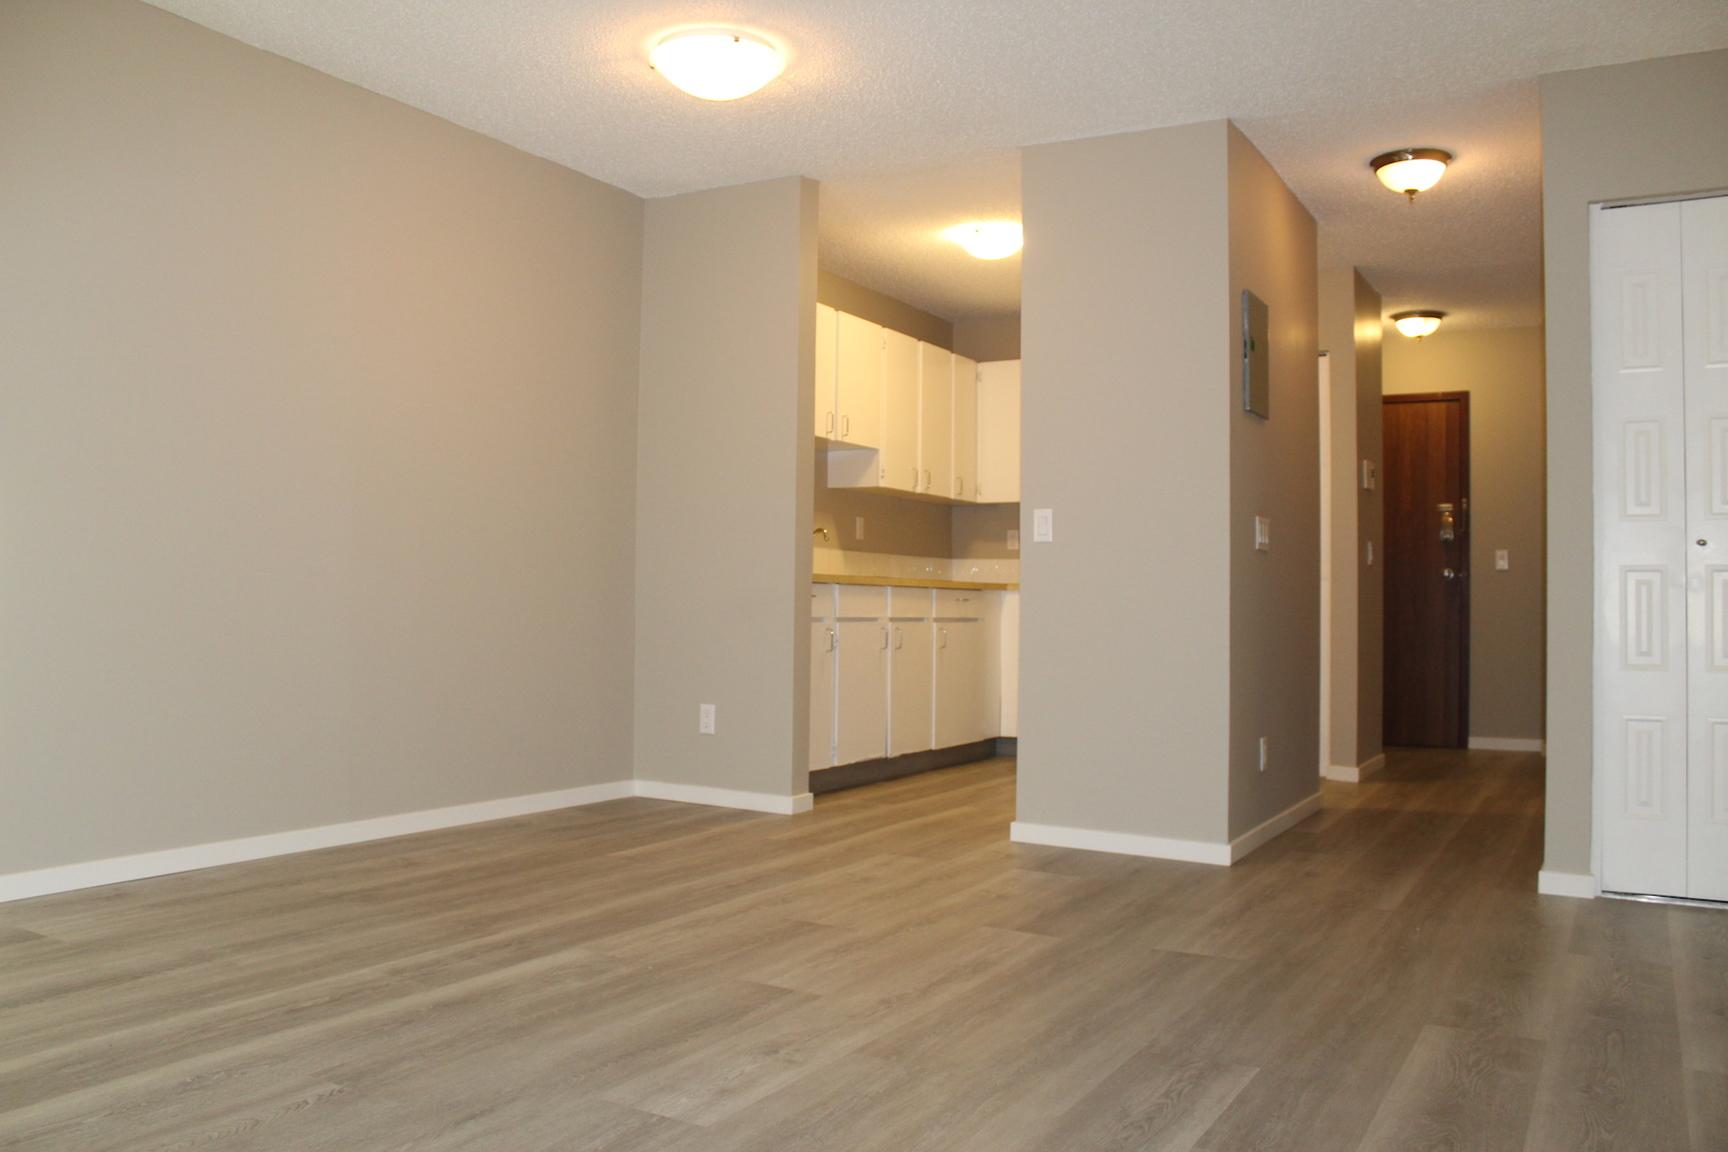 419 1 Ave NE, Calgary, AB - $950